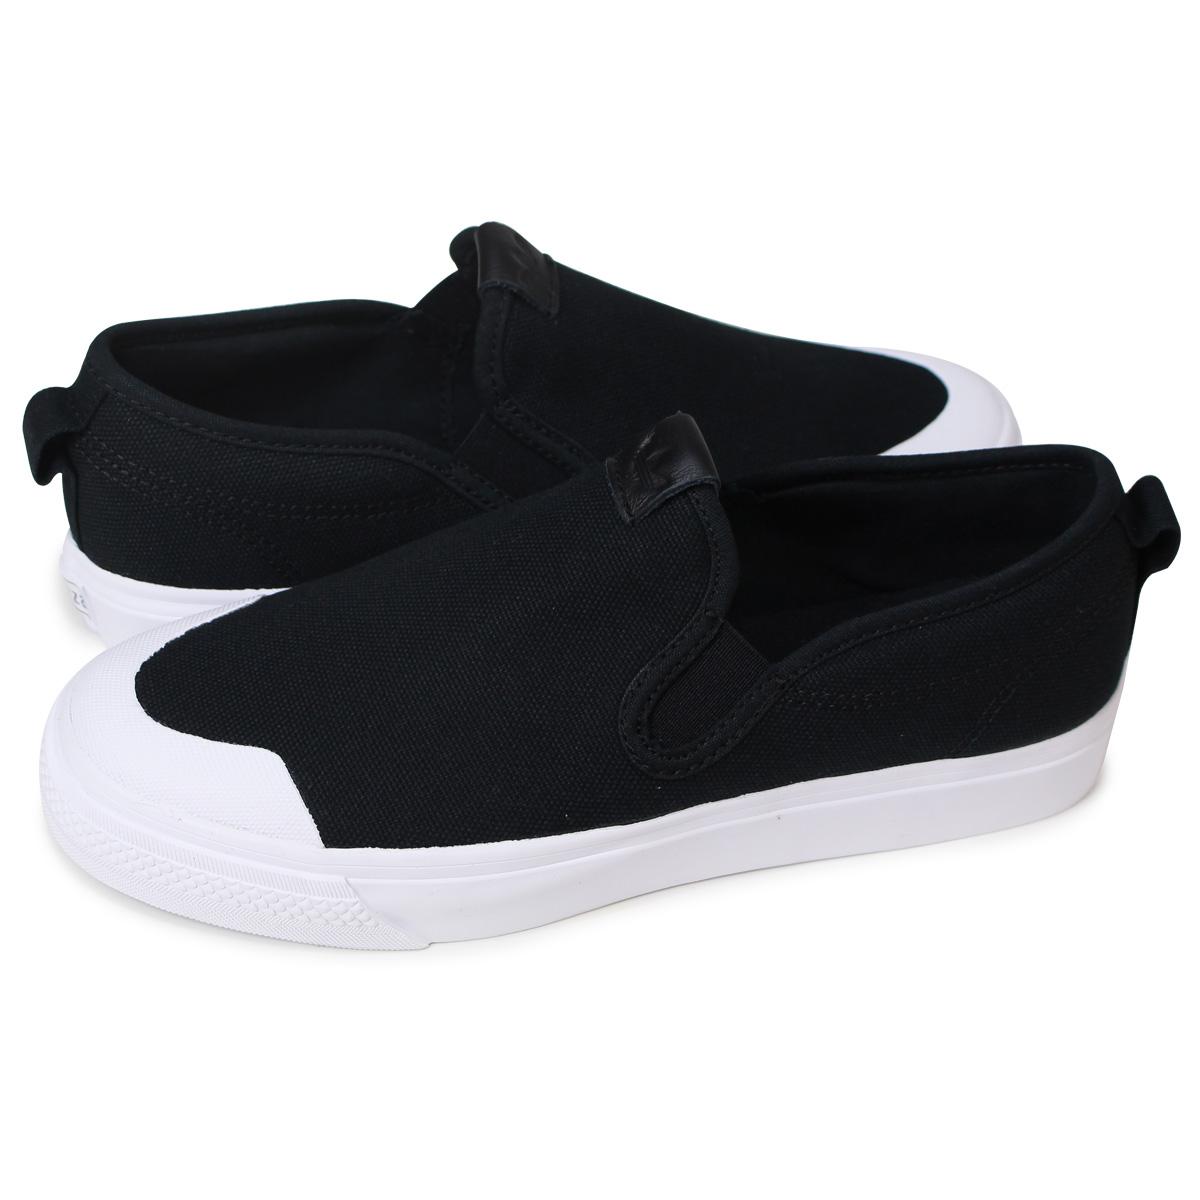 d00f4cdd60 adidas Originals NIZZA SLIPON W Adidas originals Nitze that Dis slip-ons  sneakers black CQ3104